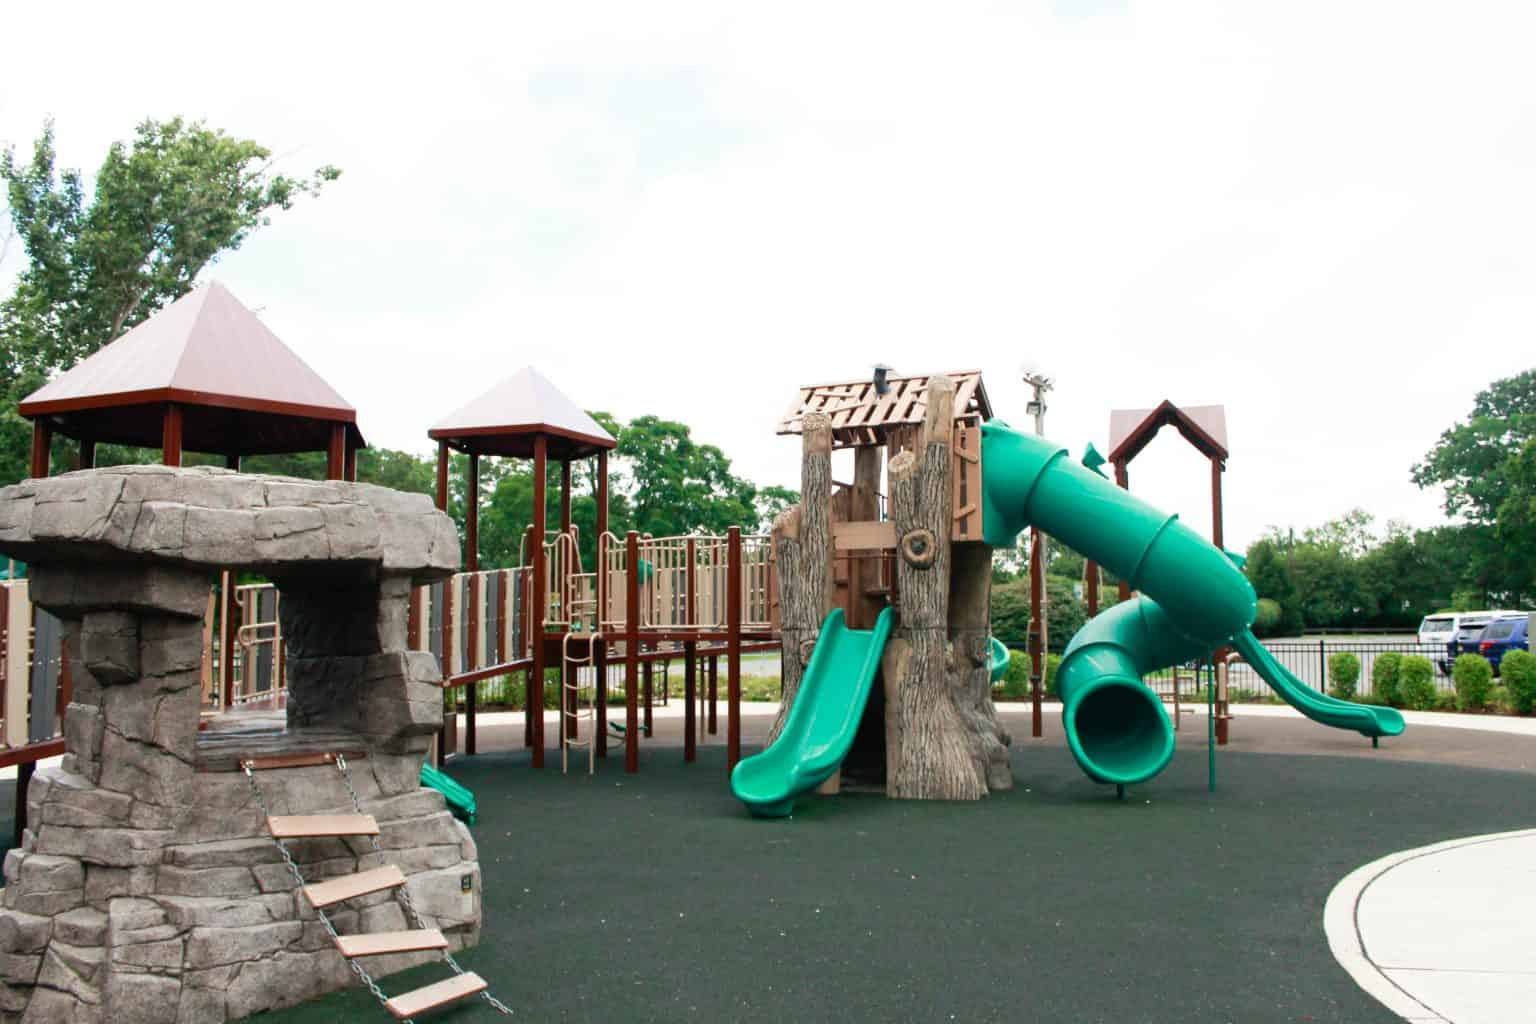 windward-beach-park-playground-brick-nj_27651421643_o-1-1536x1024